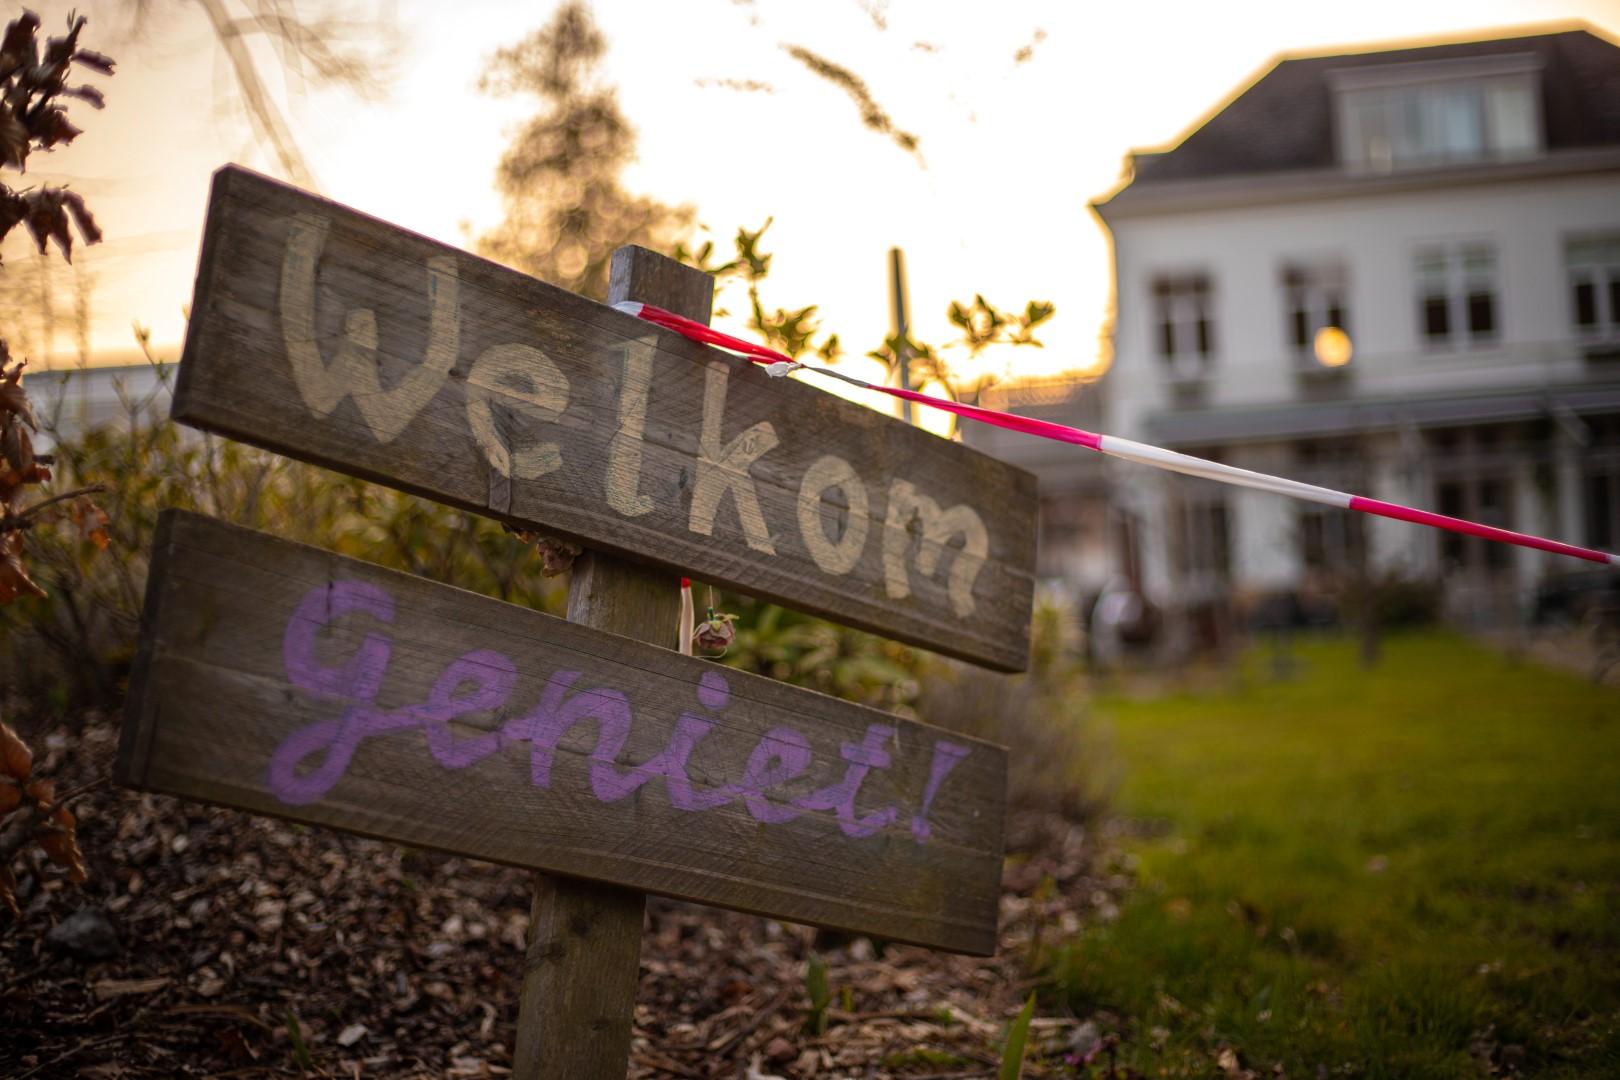 landgoed lievensberg zonsondergang zon golden hour goude uur welkom geniet take away boutique hotel villa heidetuin